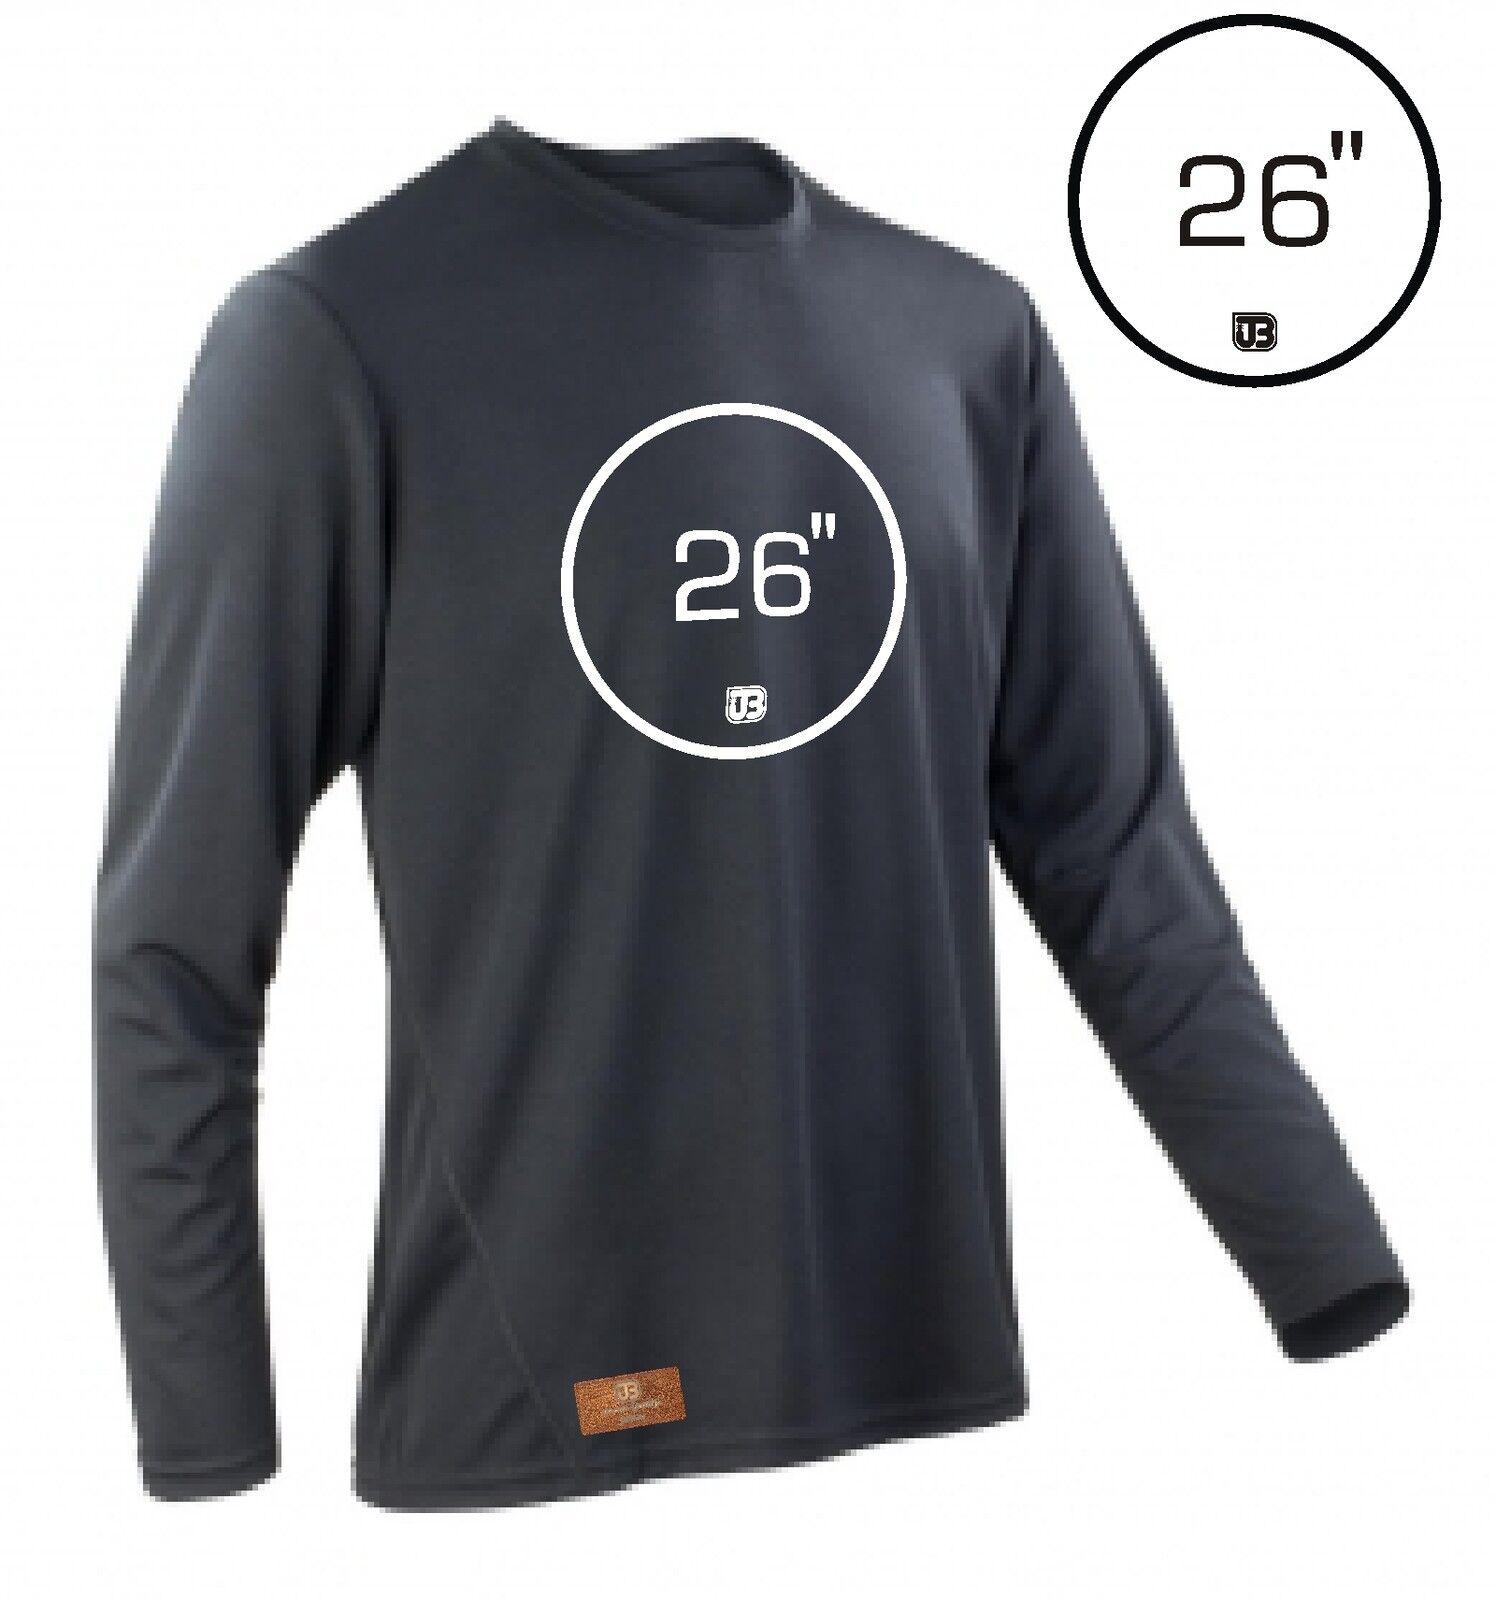 Jollify 26   26 Inch Mountain Bike Shirt Tricot MTB Bike Dh XC Am Enduro Jersey